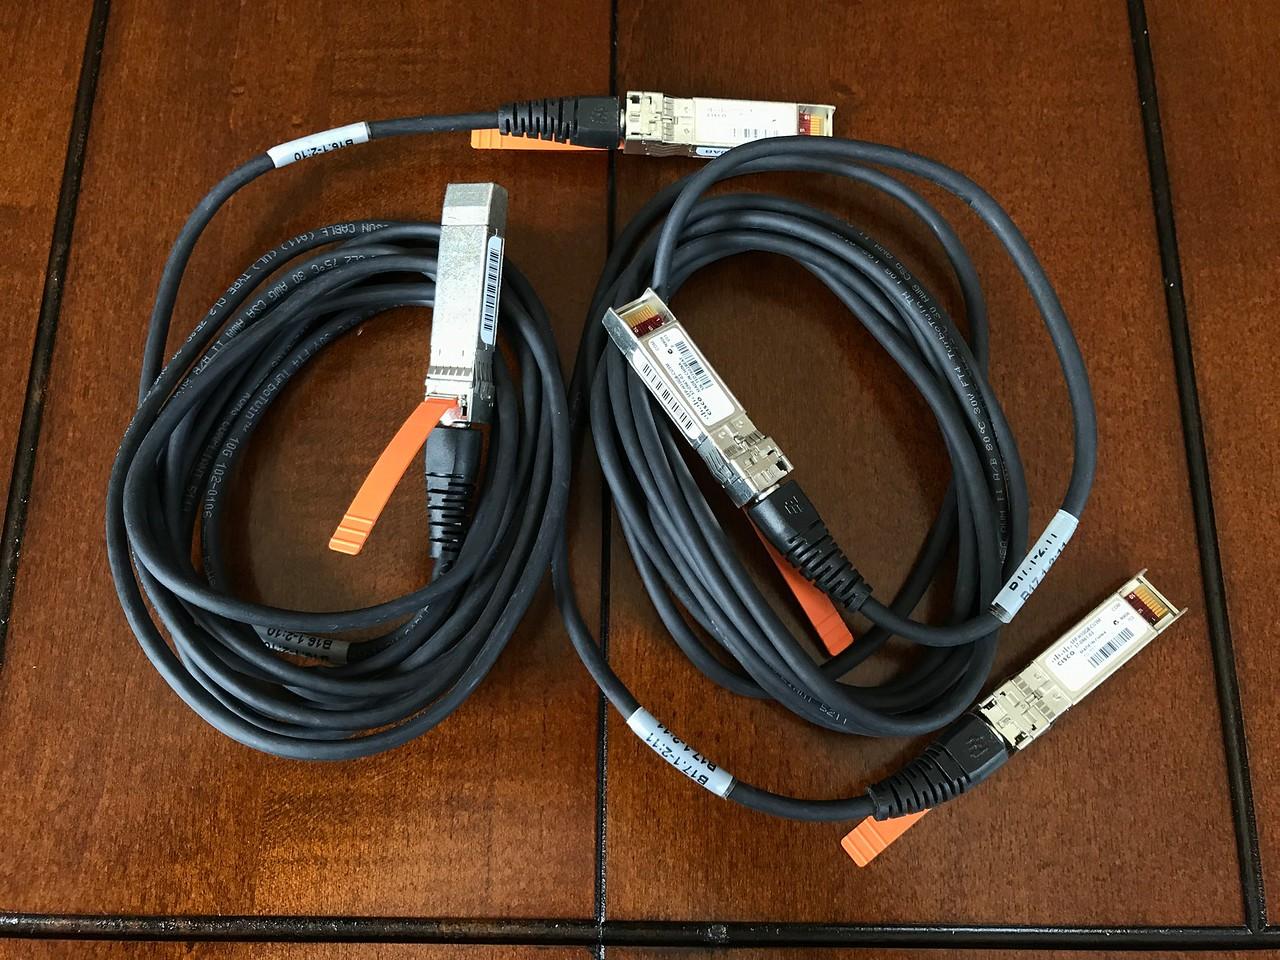 2x Cisco SFP-H10GB-CU3M 10GBe DAC Twinax cables